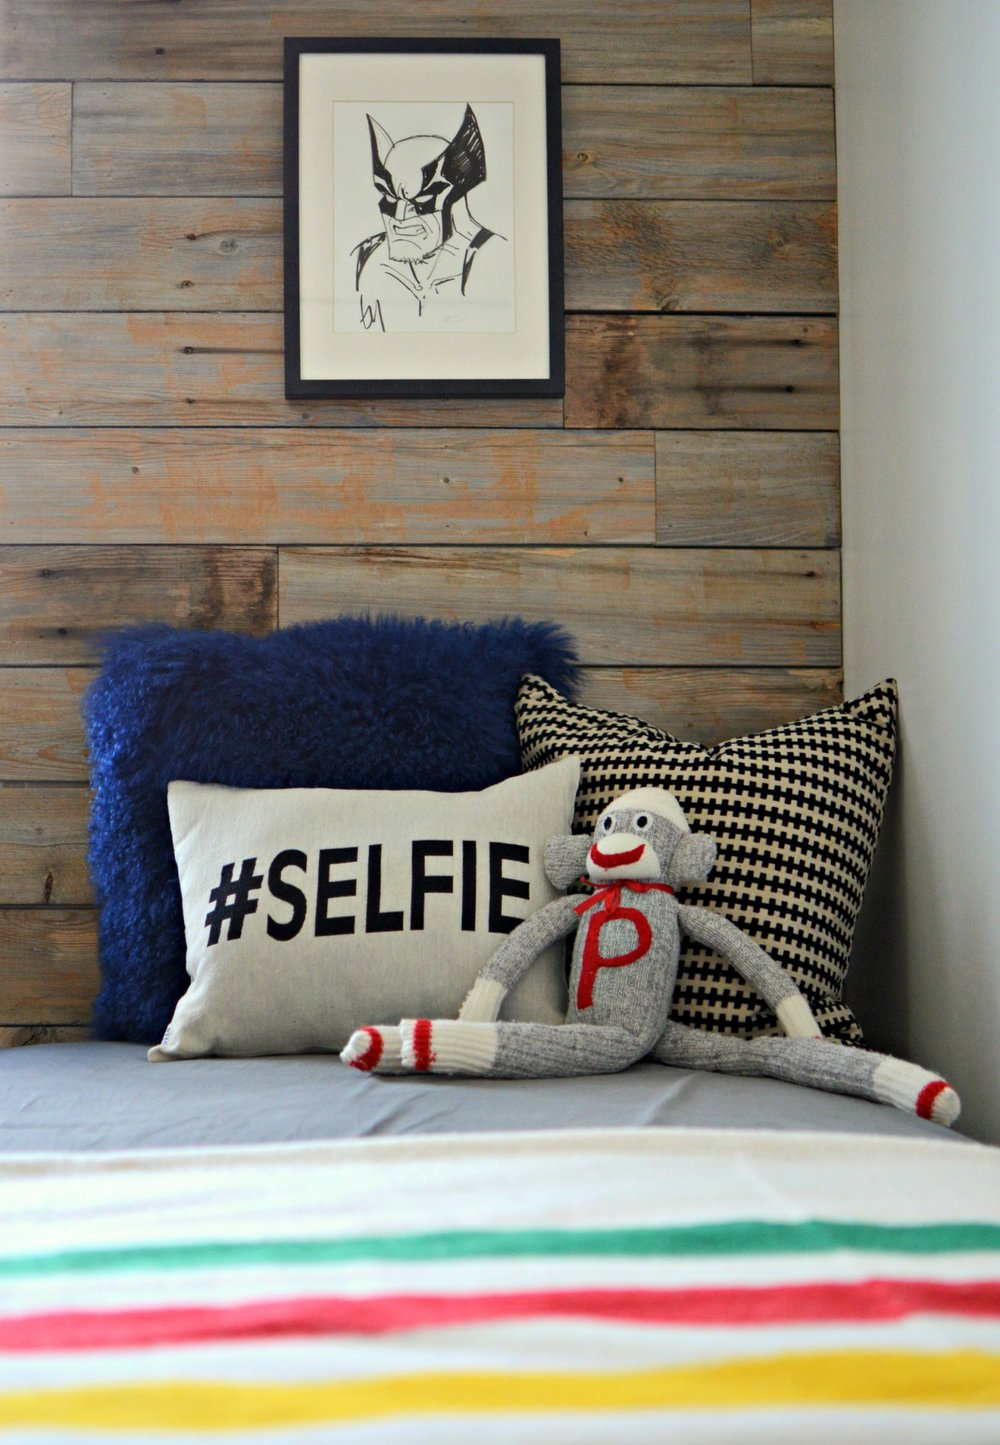 calgary-interior-designer-canadiana-boys-room-bed-5point-blanket.jpg